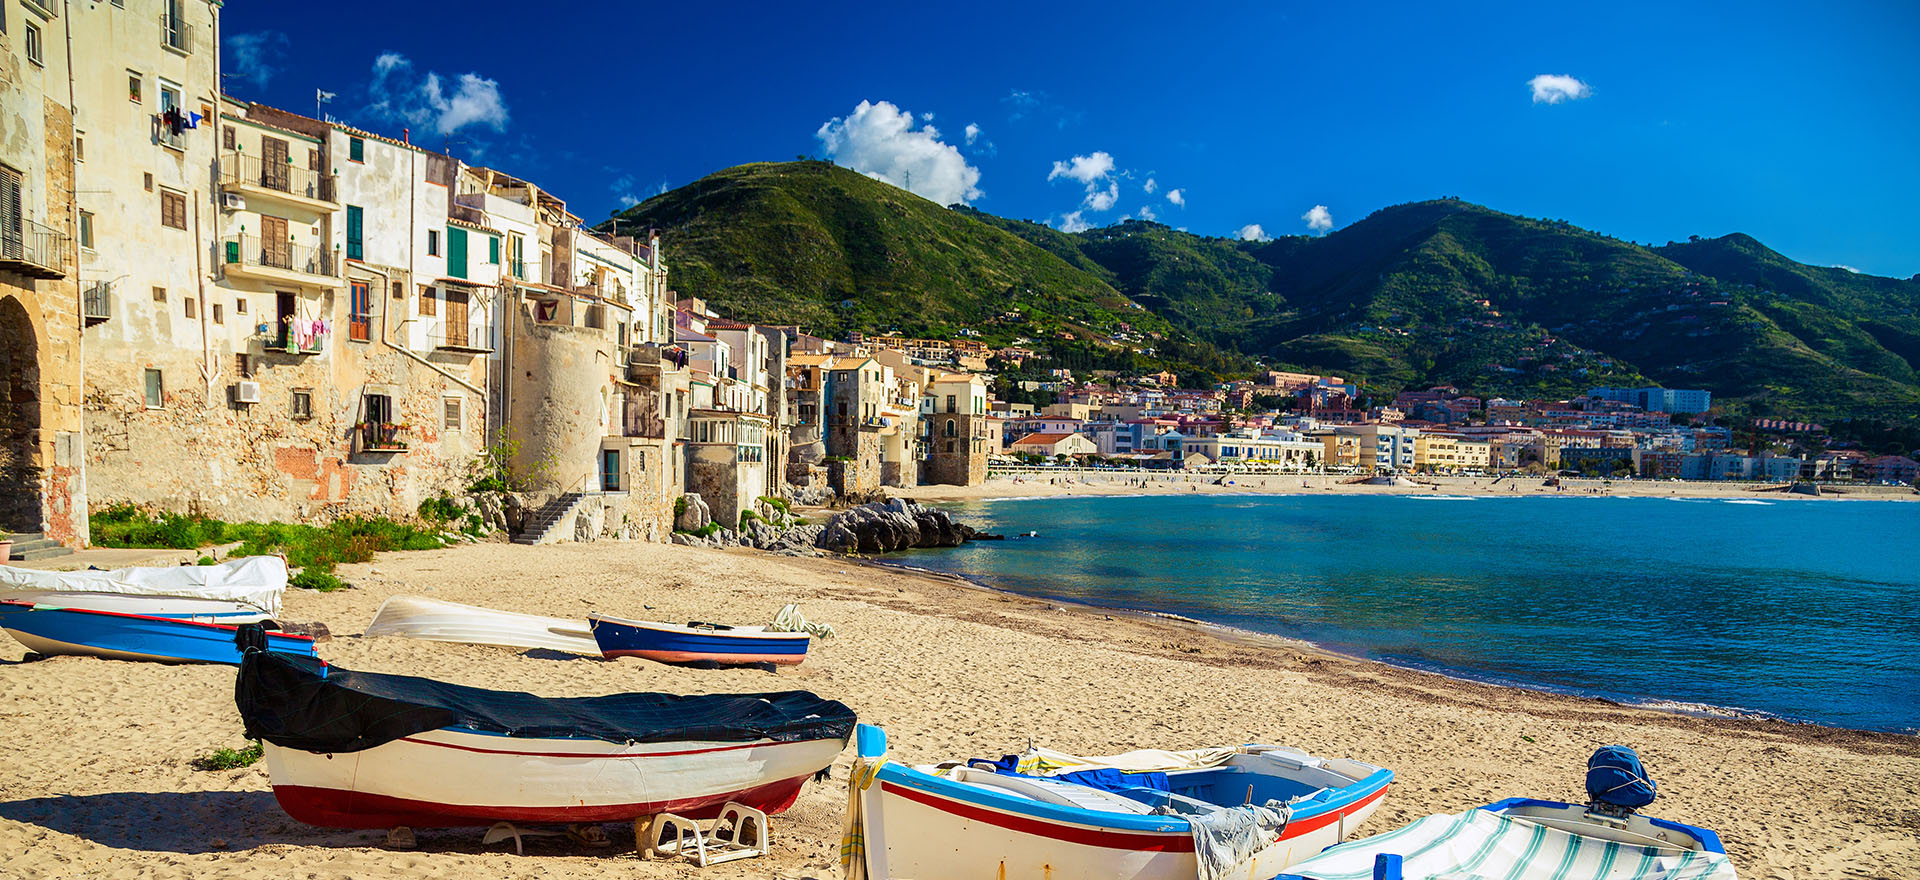 Sicily beach | Palermo | Italy| Mediterranean Tours and Cruises